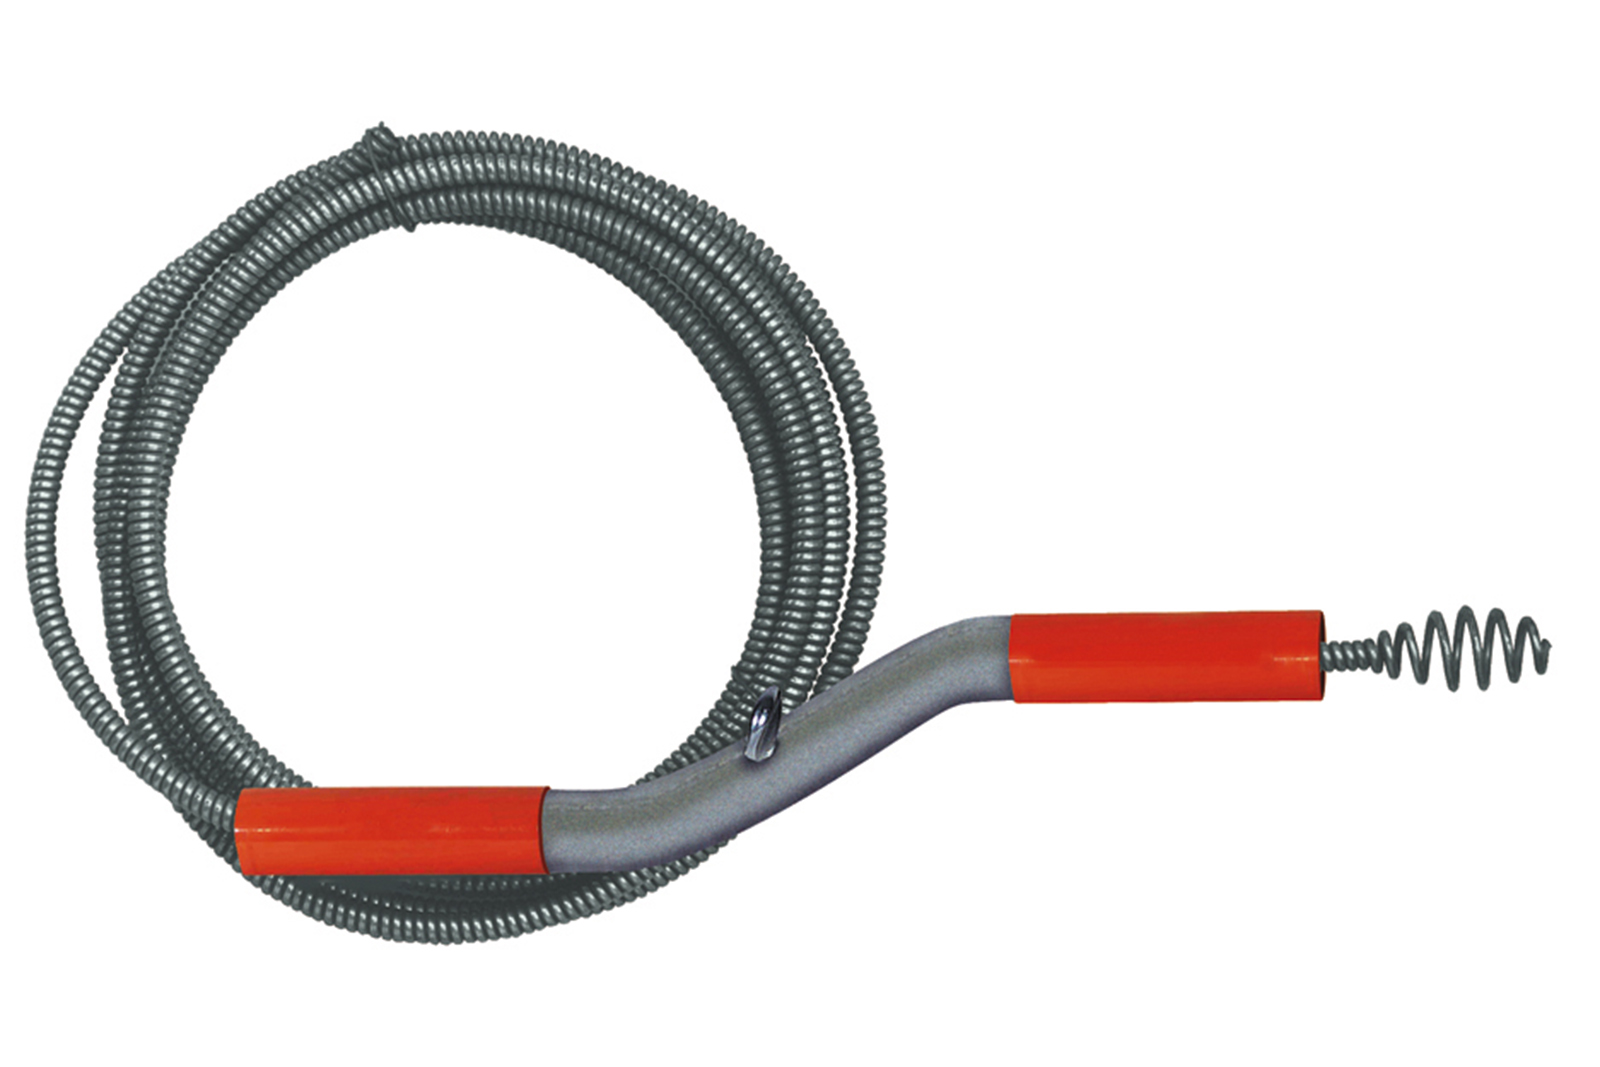 Купить Трос для прочистки General pipe Flexicore 50fl1